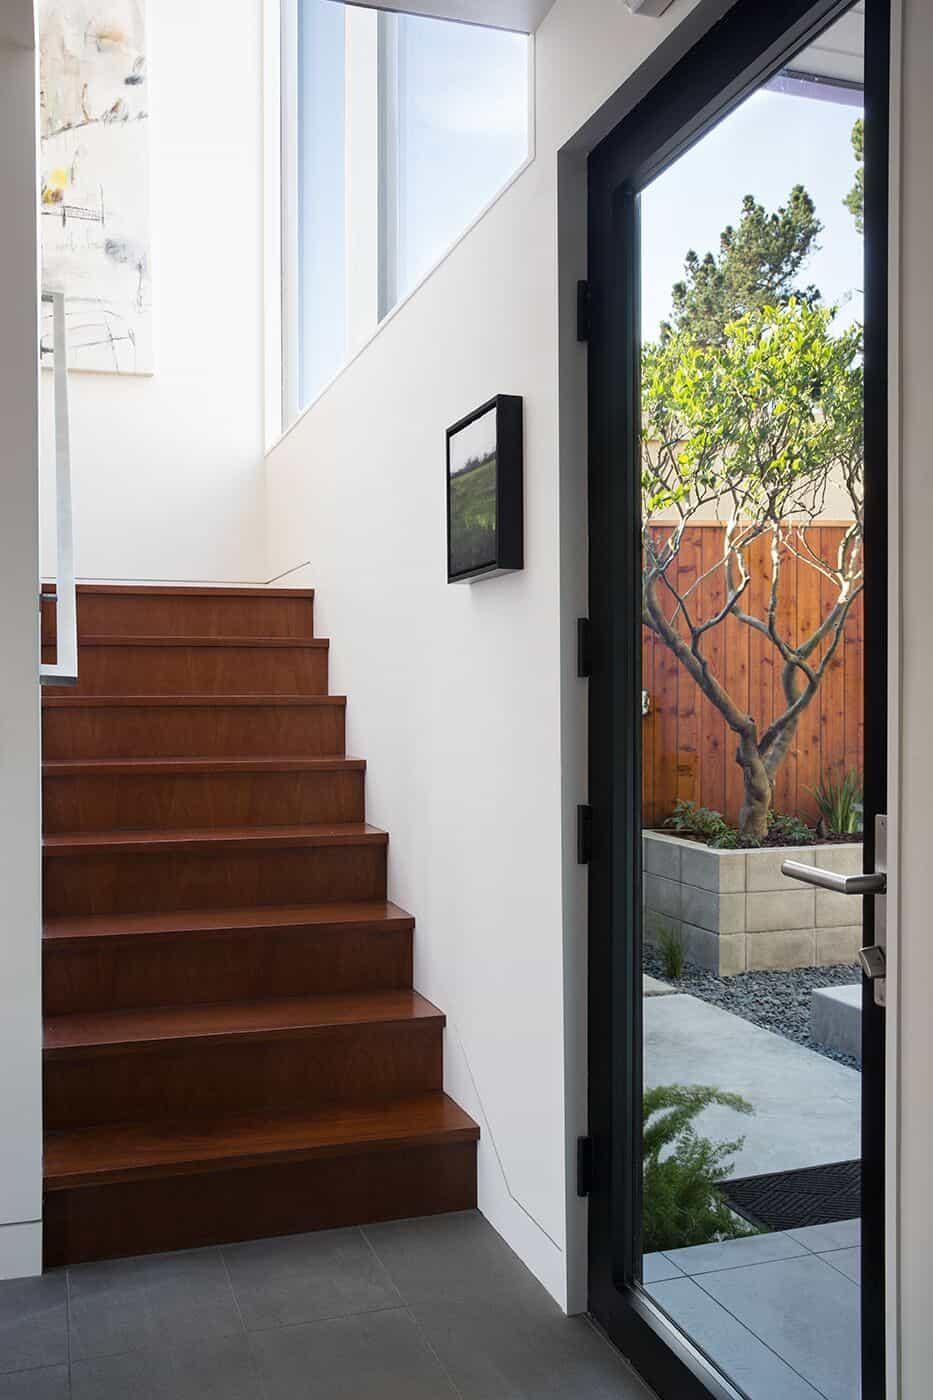 San Francisco Eichler Remodel-Klopf Architecture-13-1 Kindesign